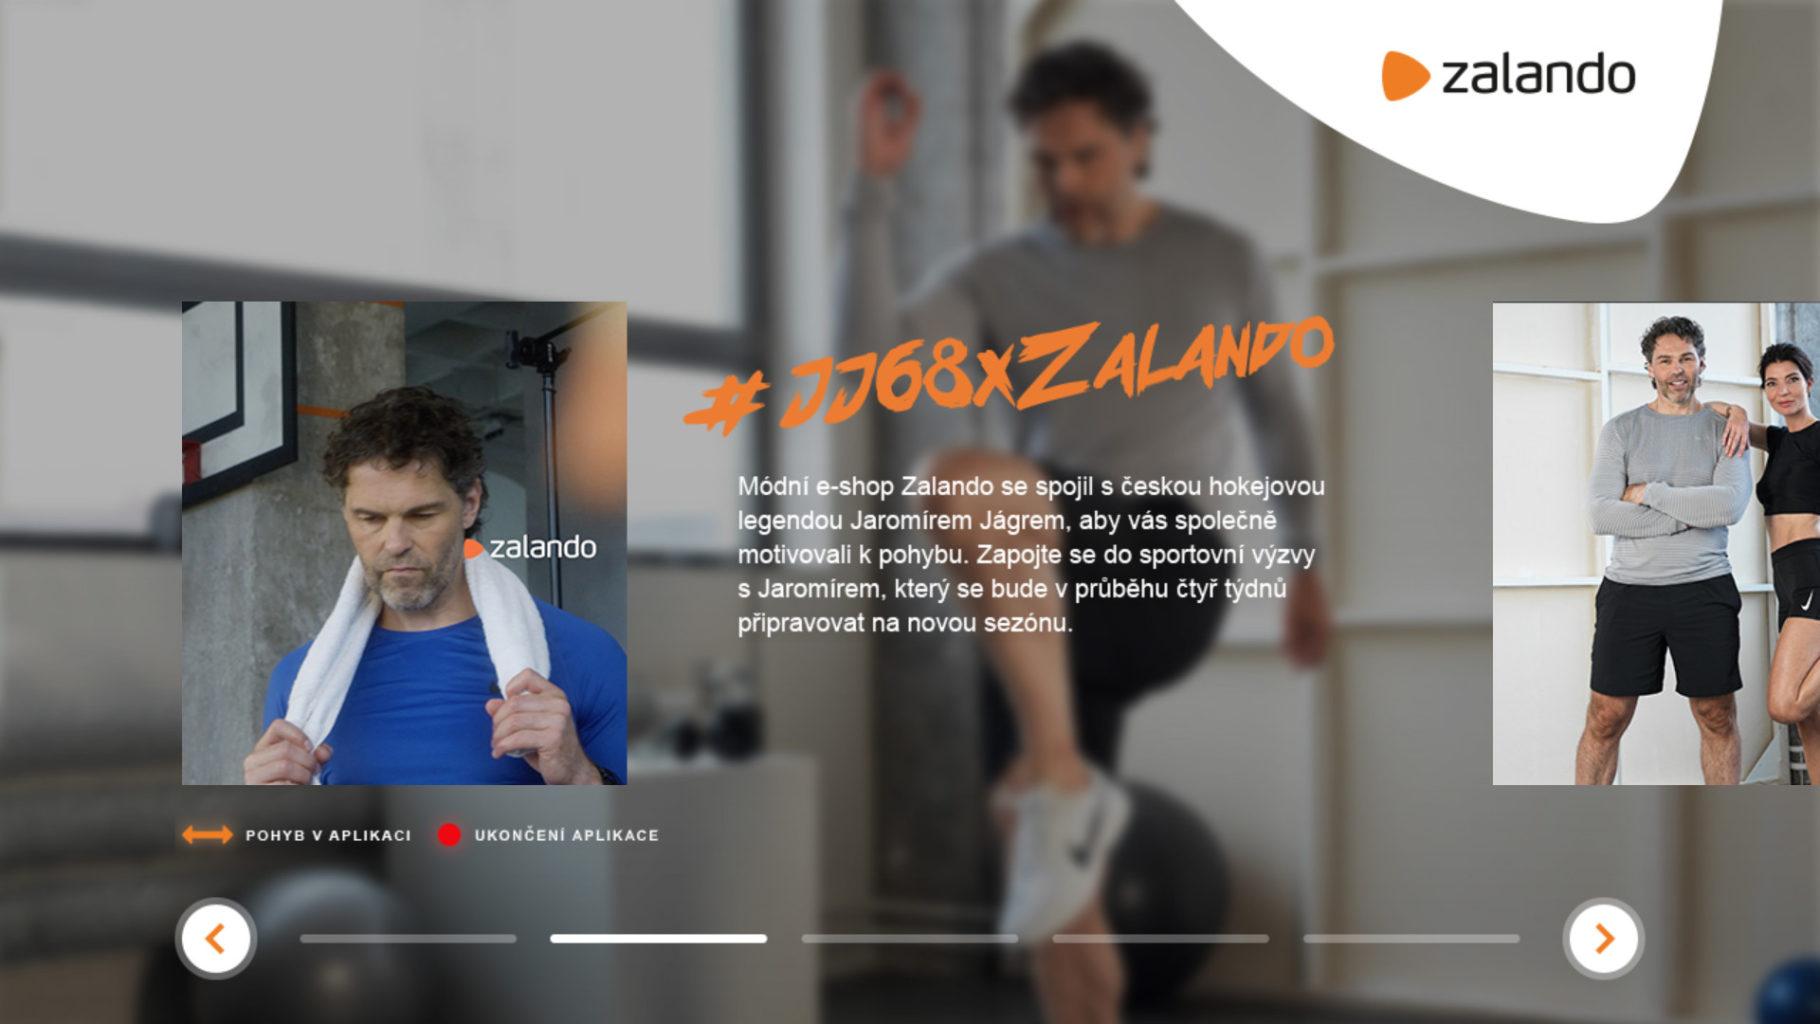 hbbtv-zalando02